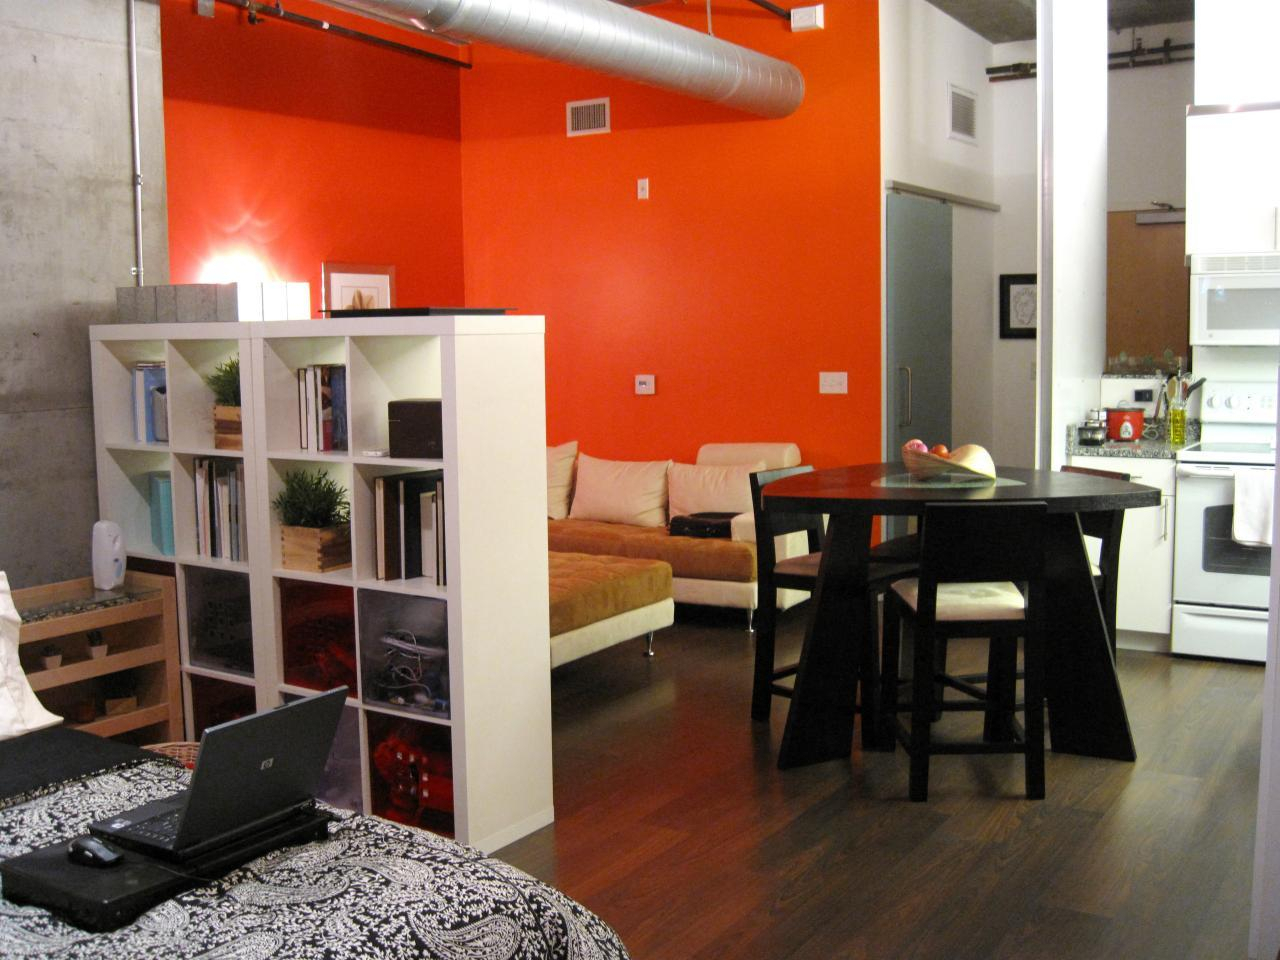 10 Fantastic Decorating Ideas For Studio Apartment studio apt decorating furnishing a small apartment on budget latest 2020